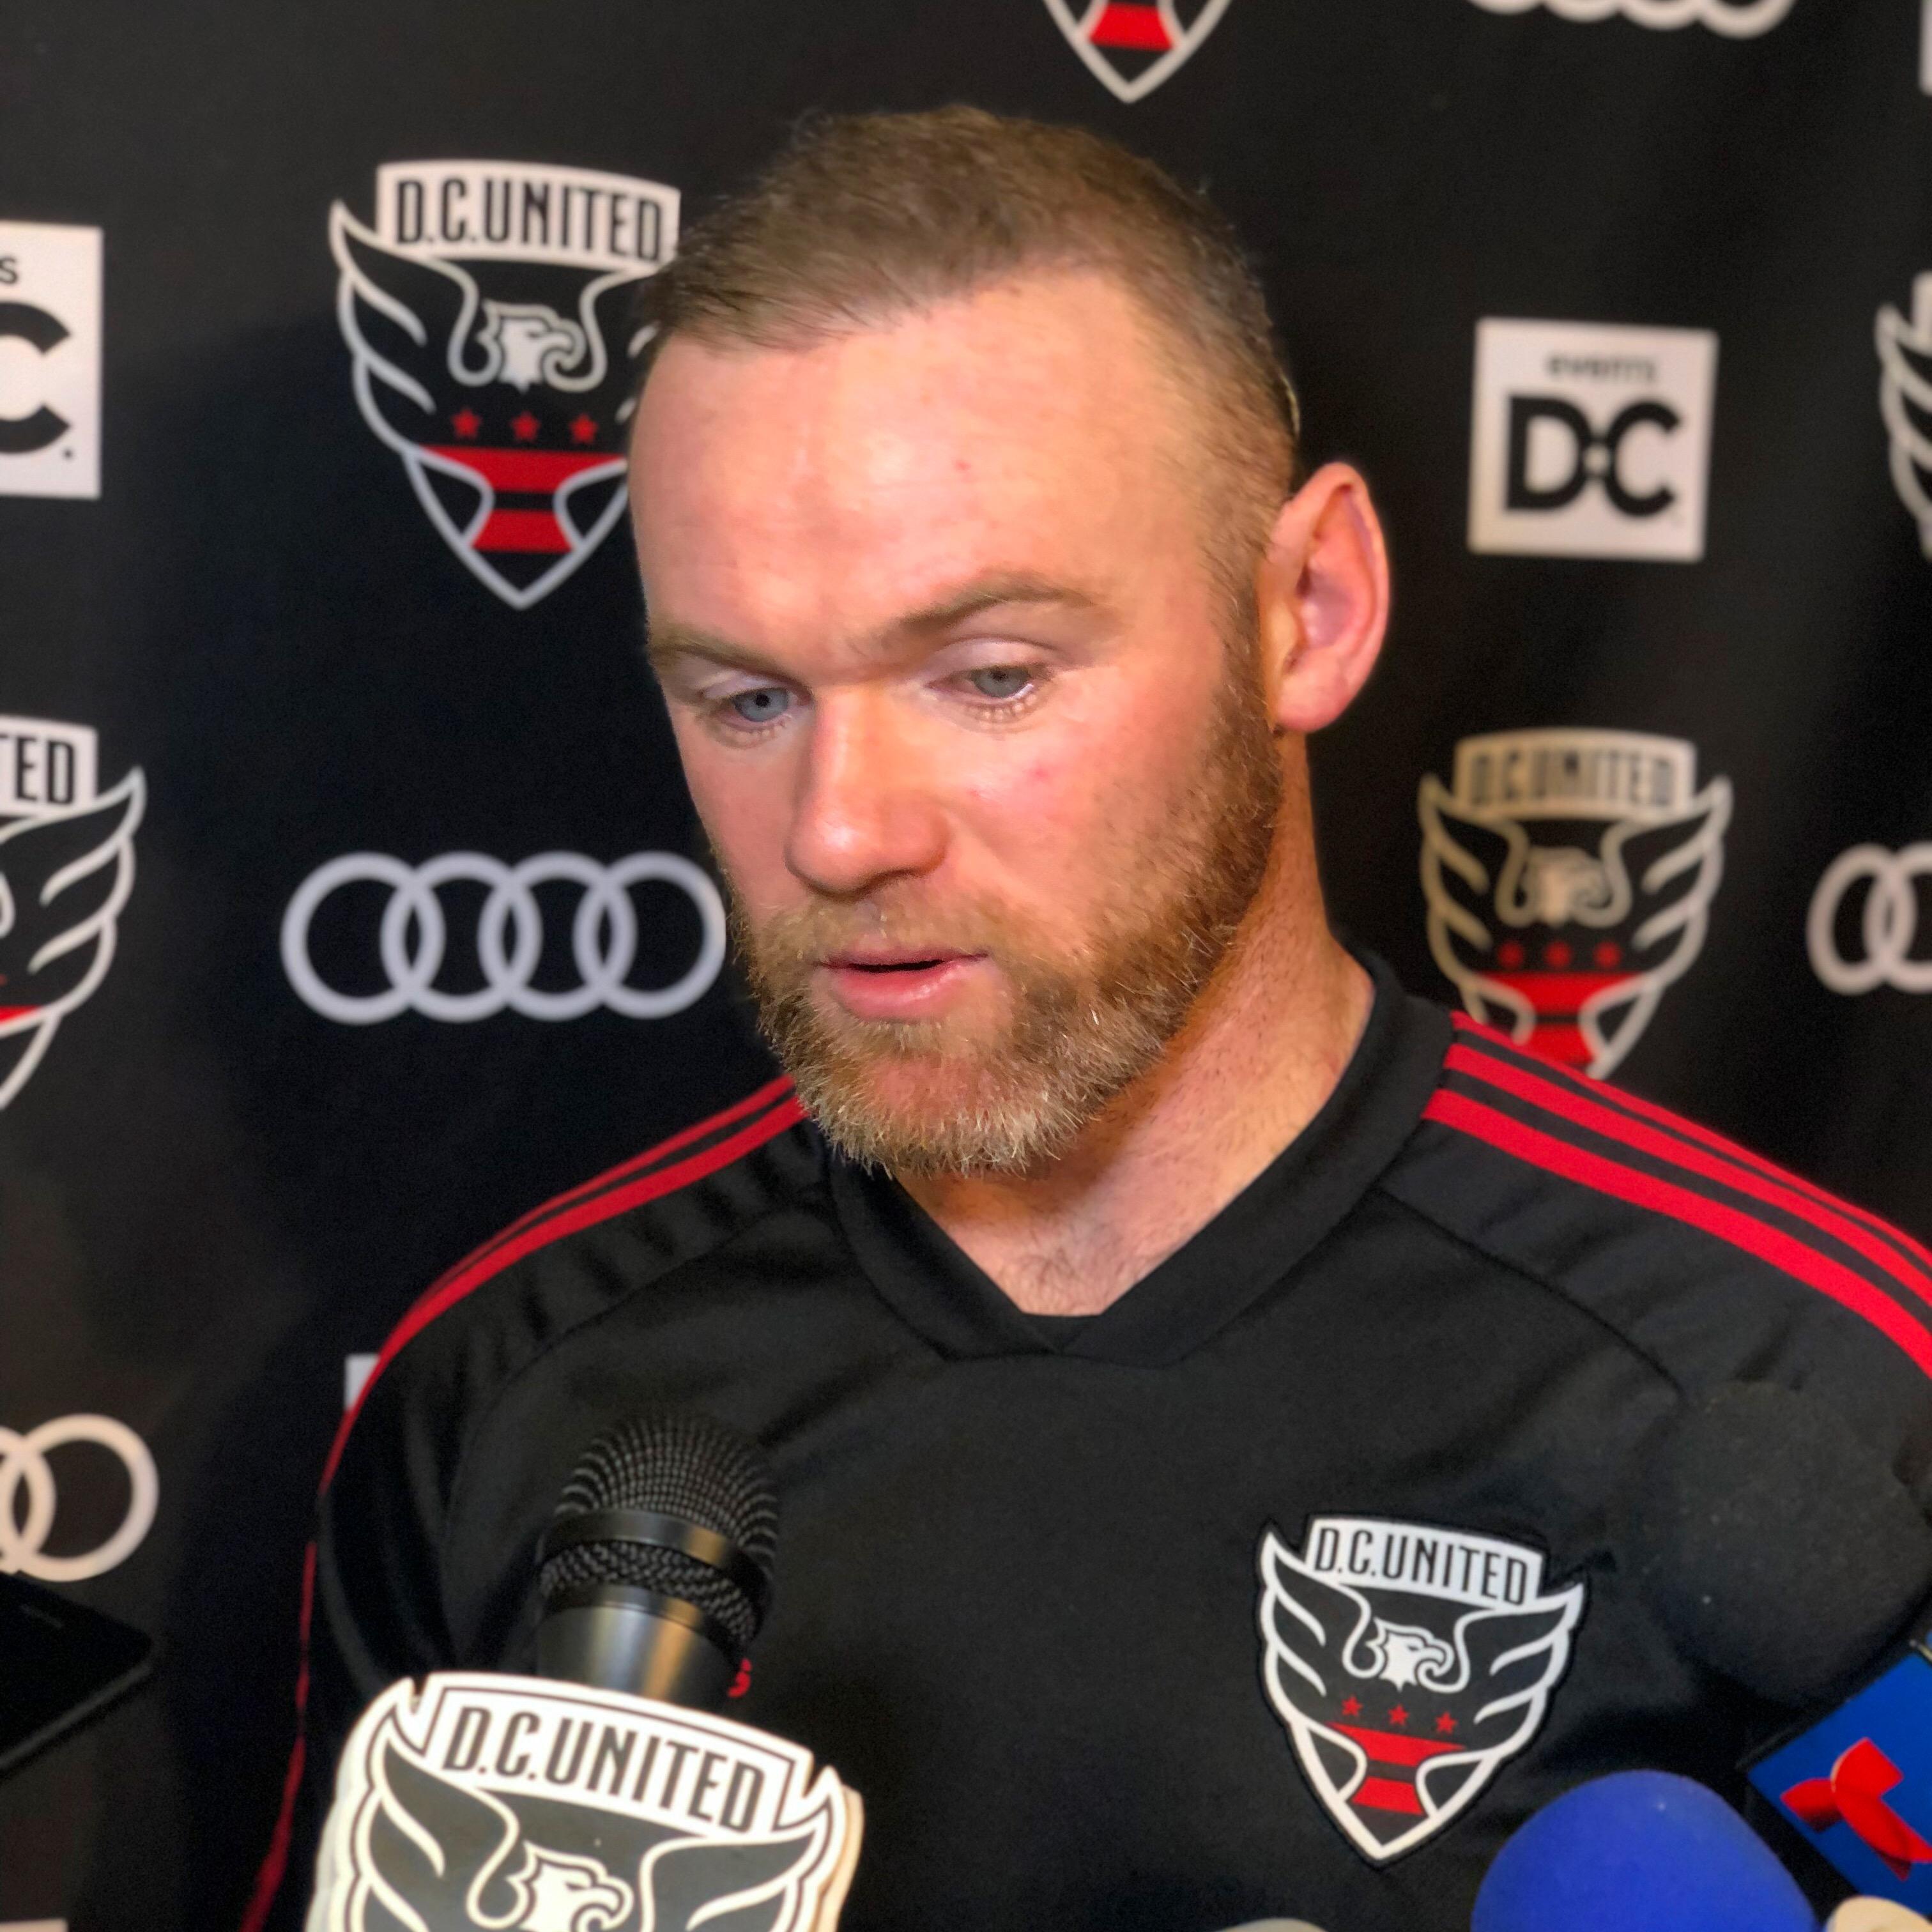 Wayne Rooney at D.C. United's preseason media day on January 23, 2019.